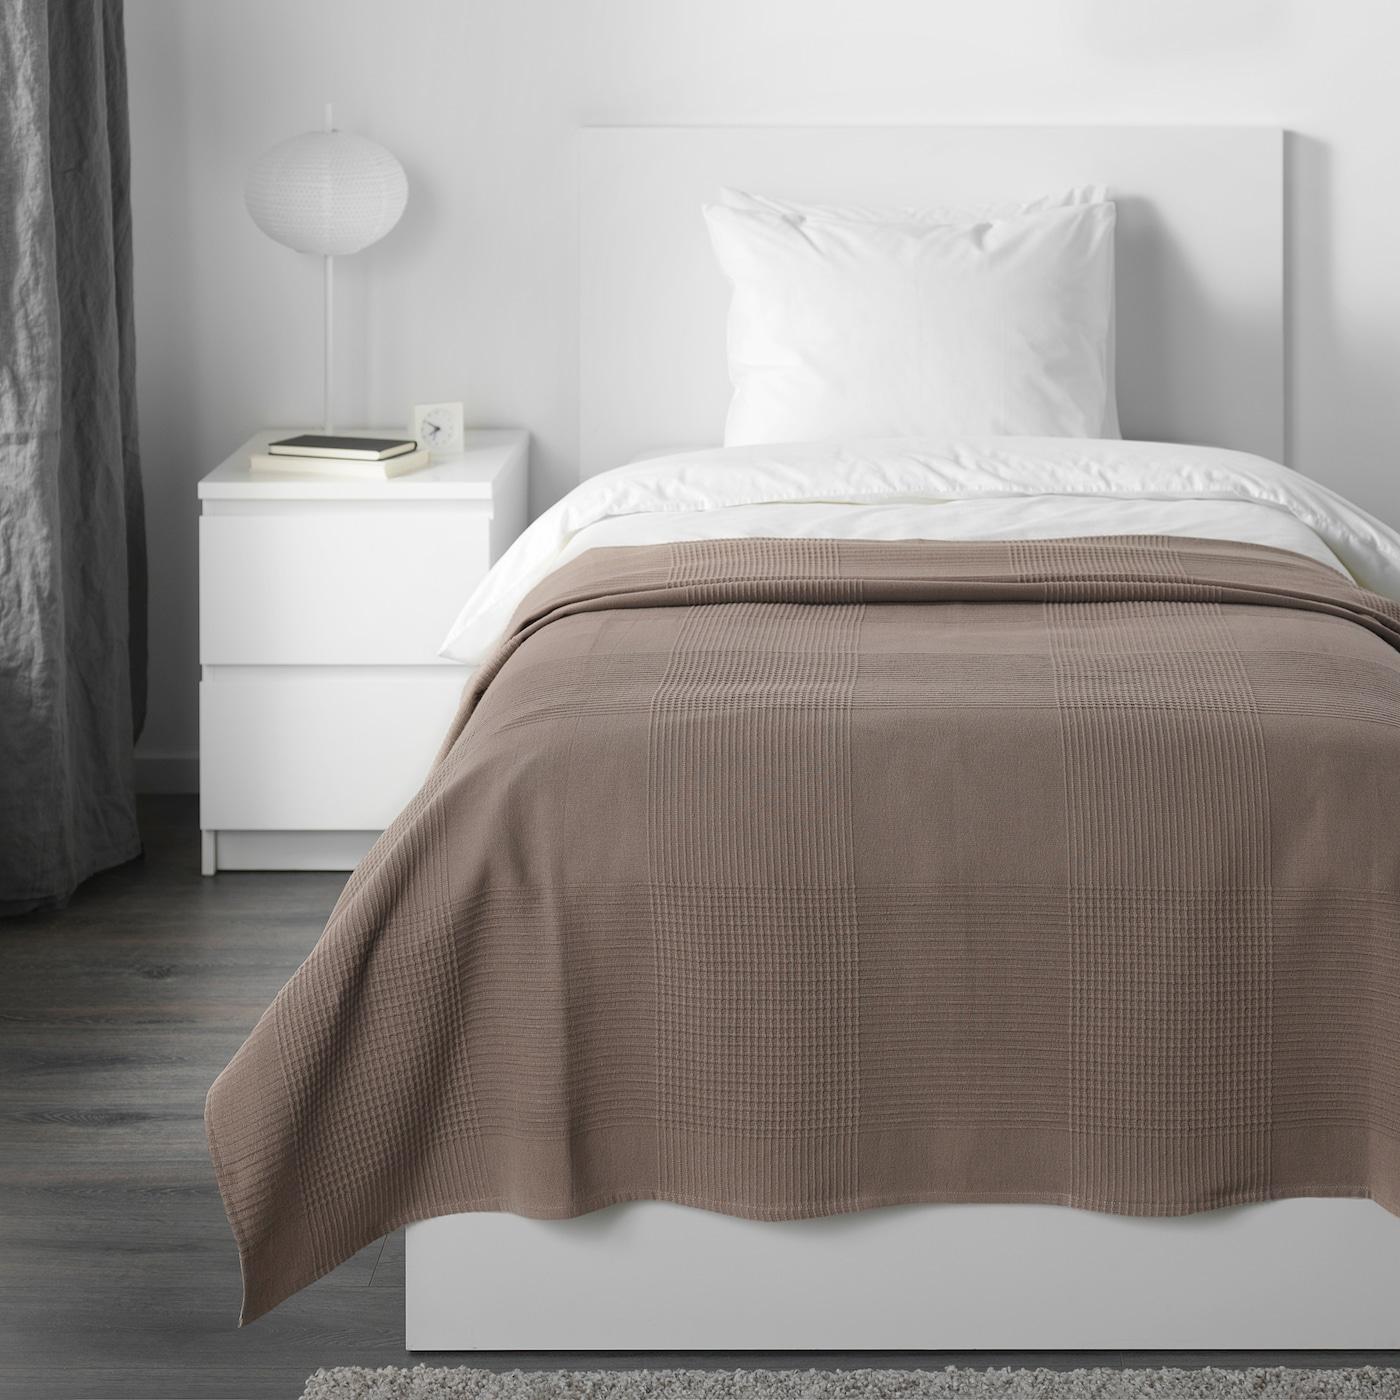 INDIRA Colcha, marrón claro, 150x250 cm IKEA